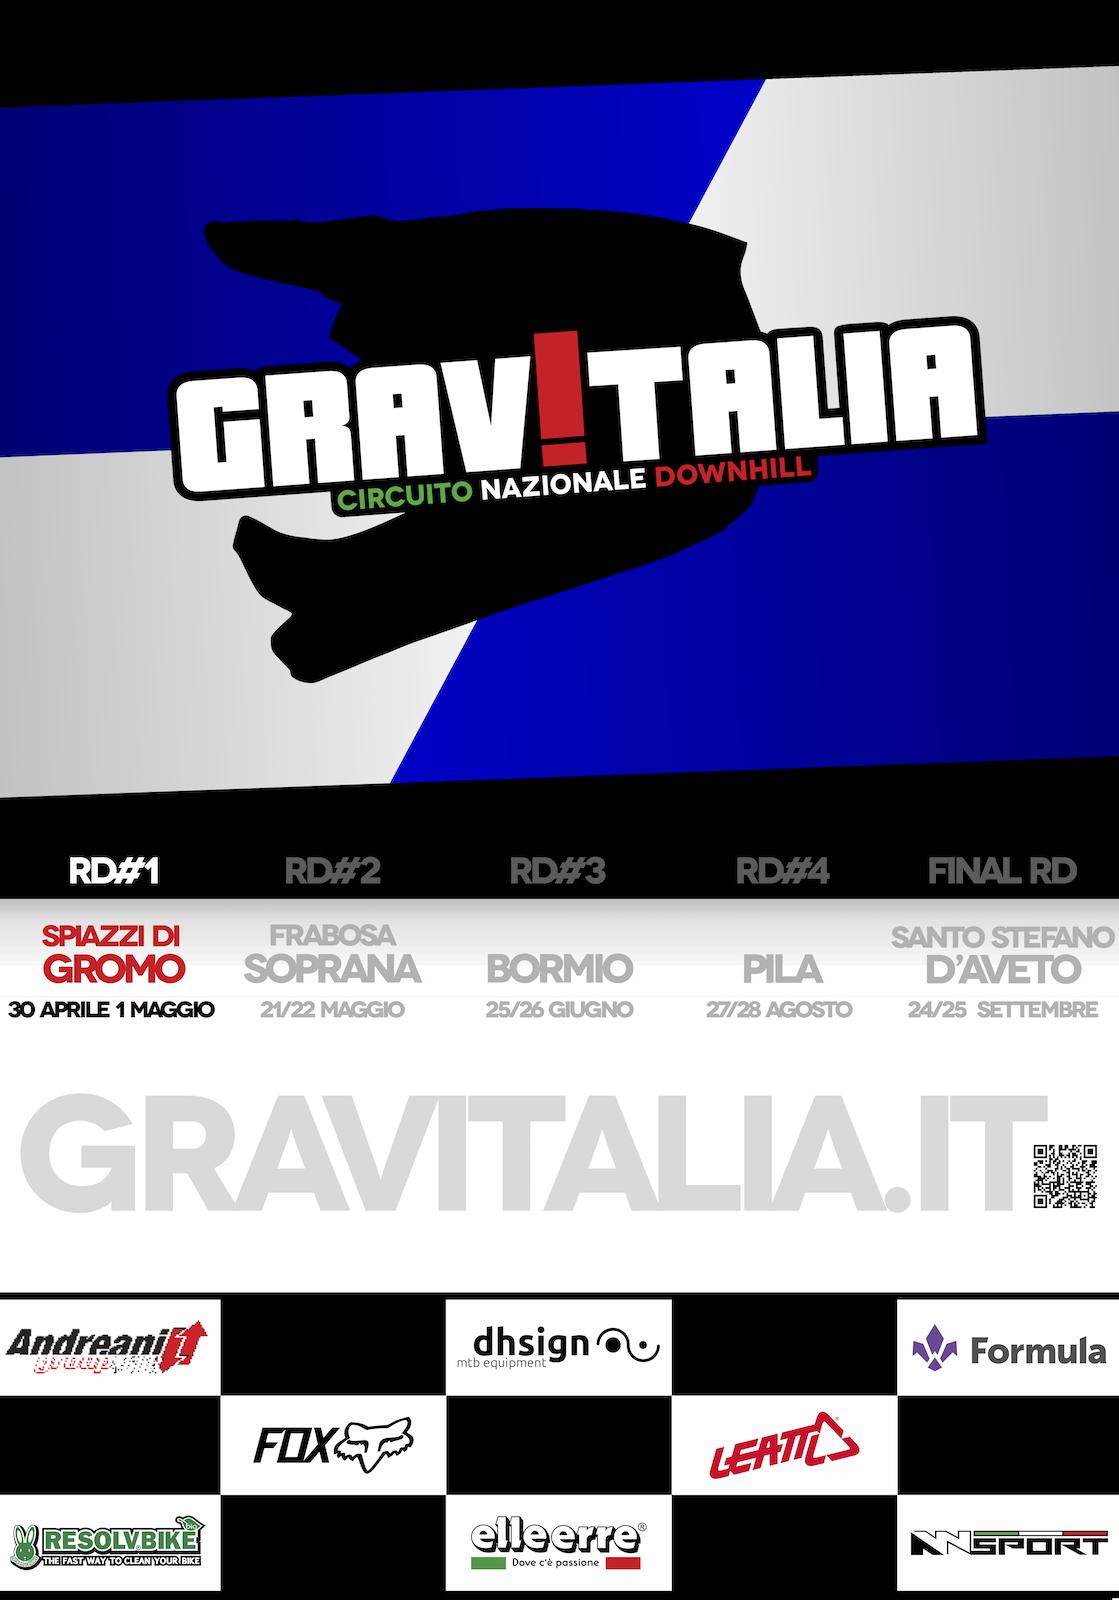 locandina-gravitalia-2016